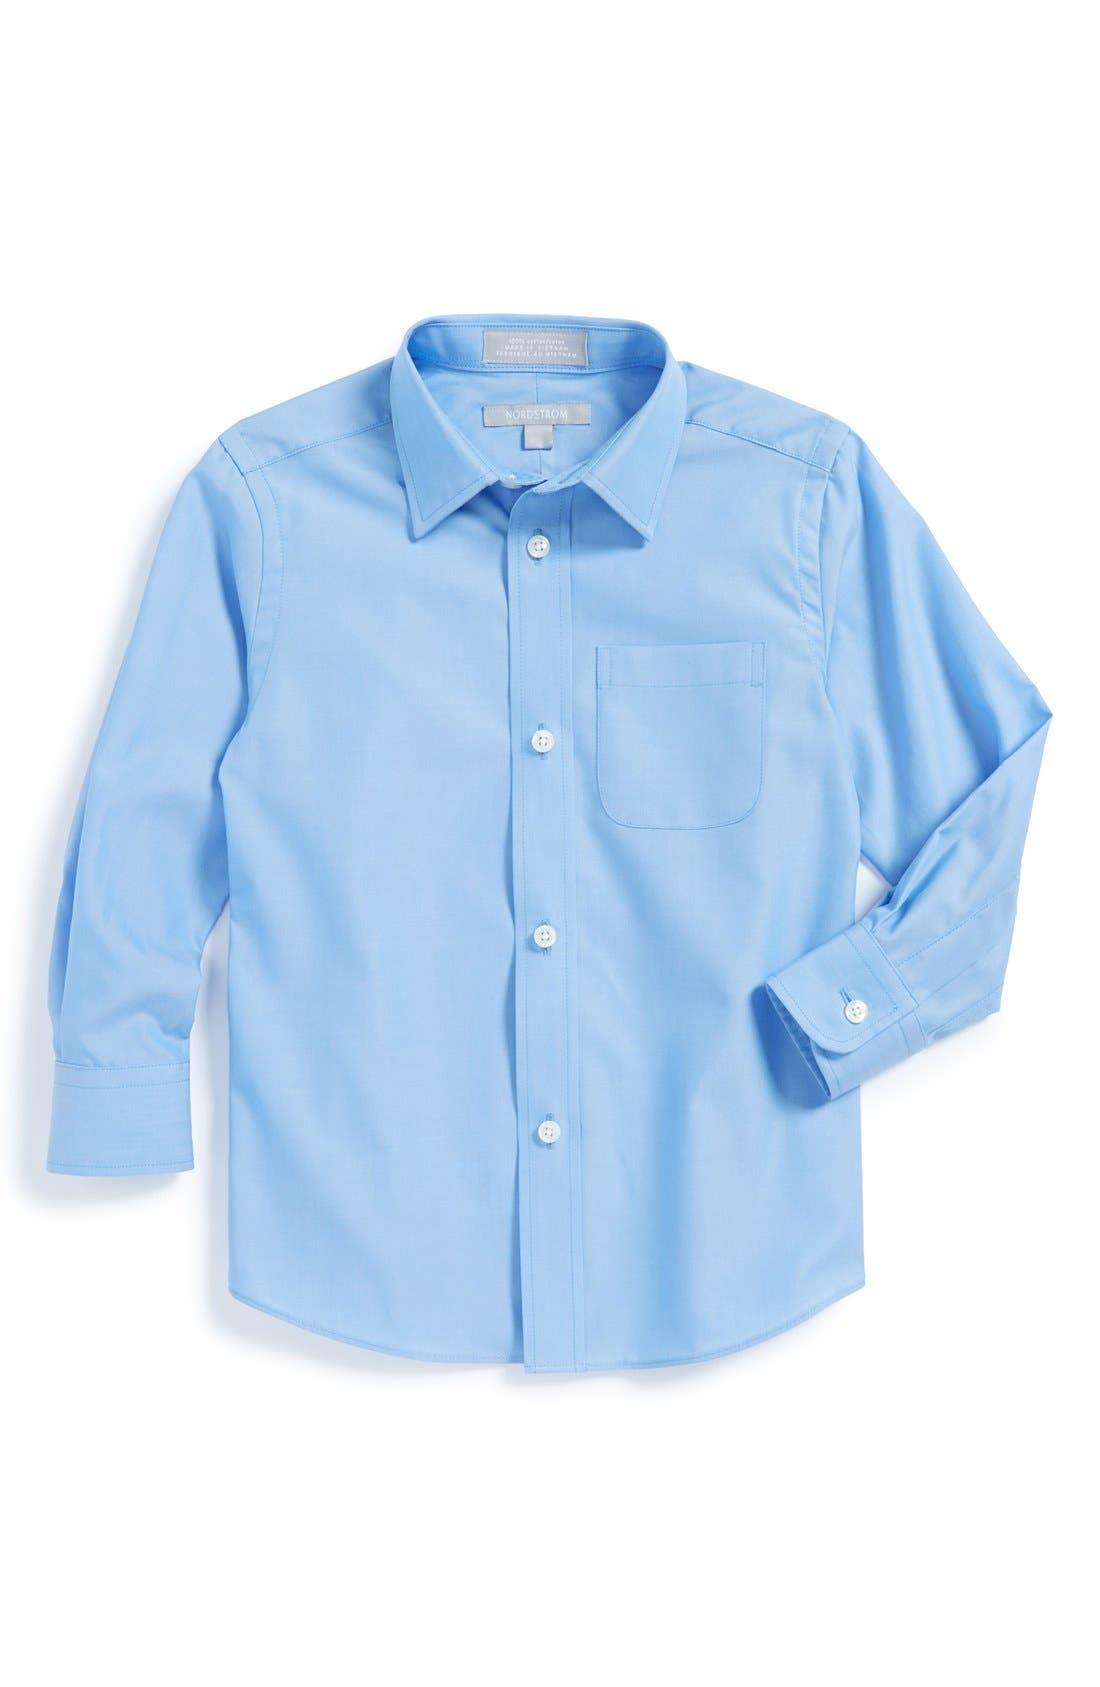 Main Image - Nordstrom Cotton Poplin Dress Shirt (Toddler Boys)